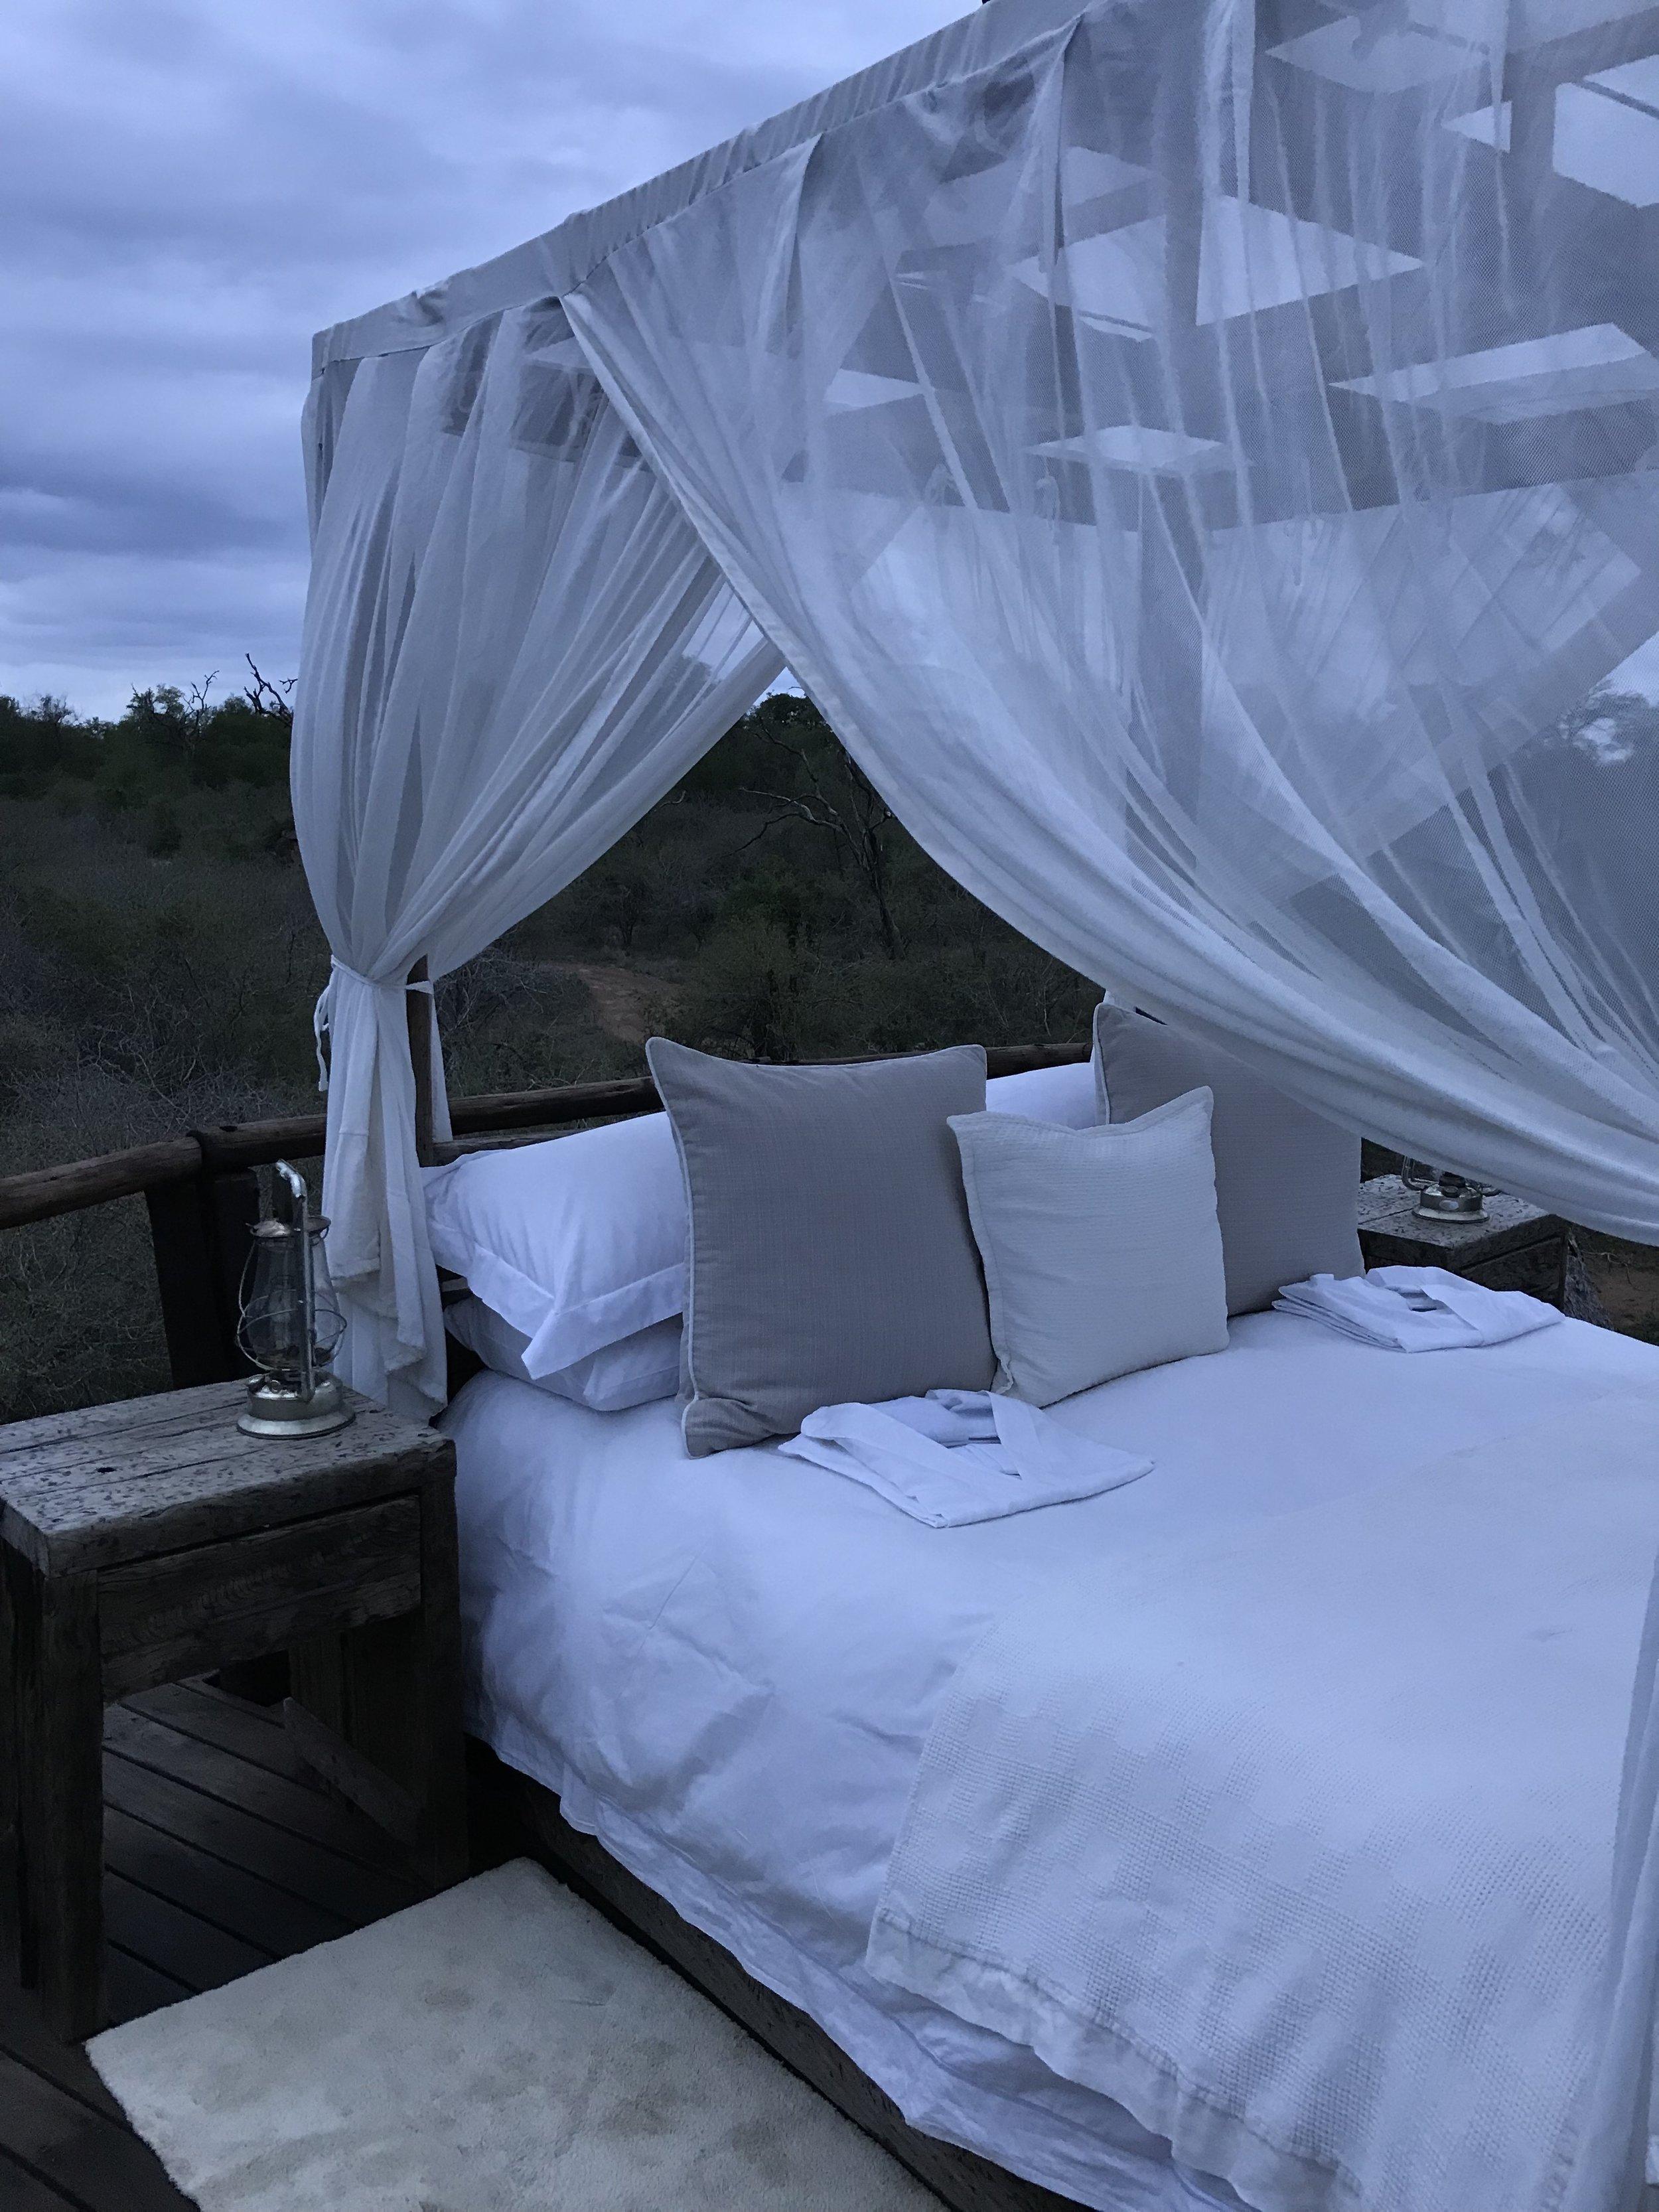 And... Sleep outside!